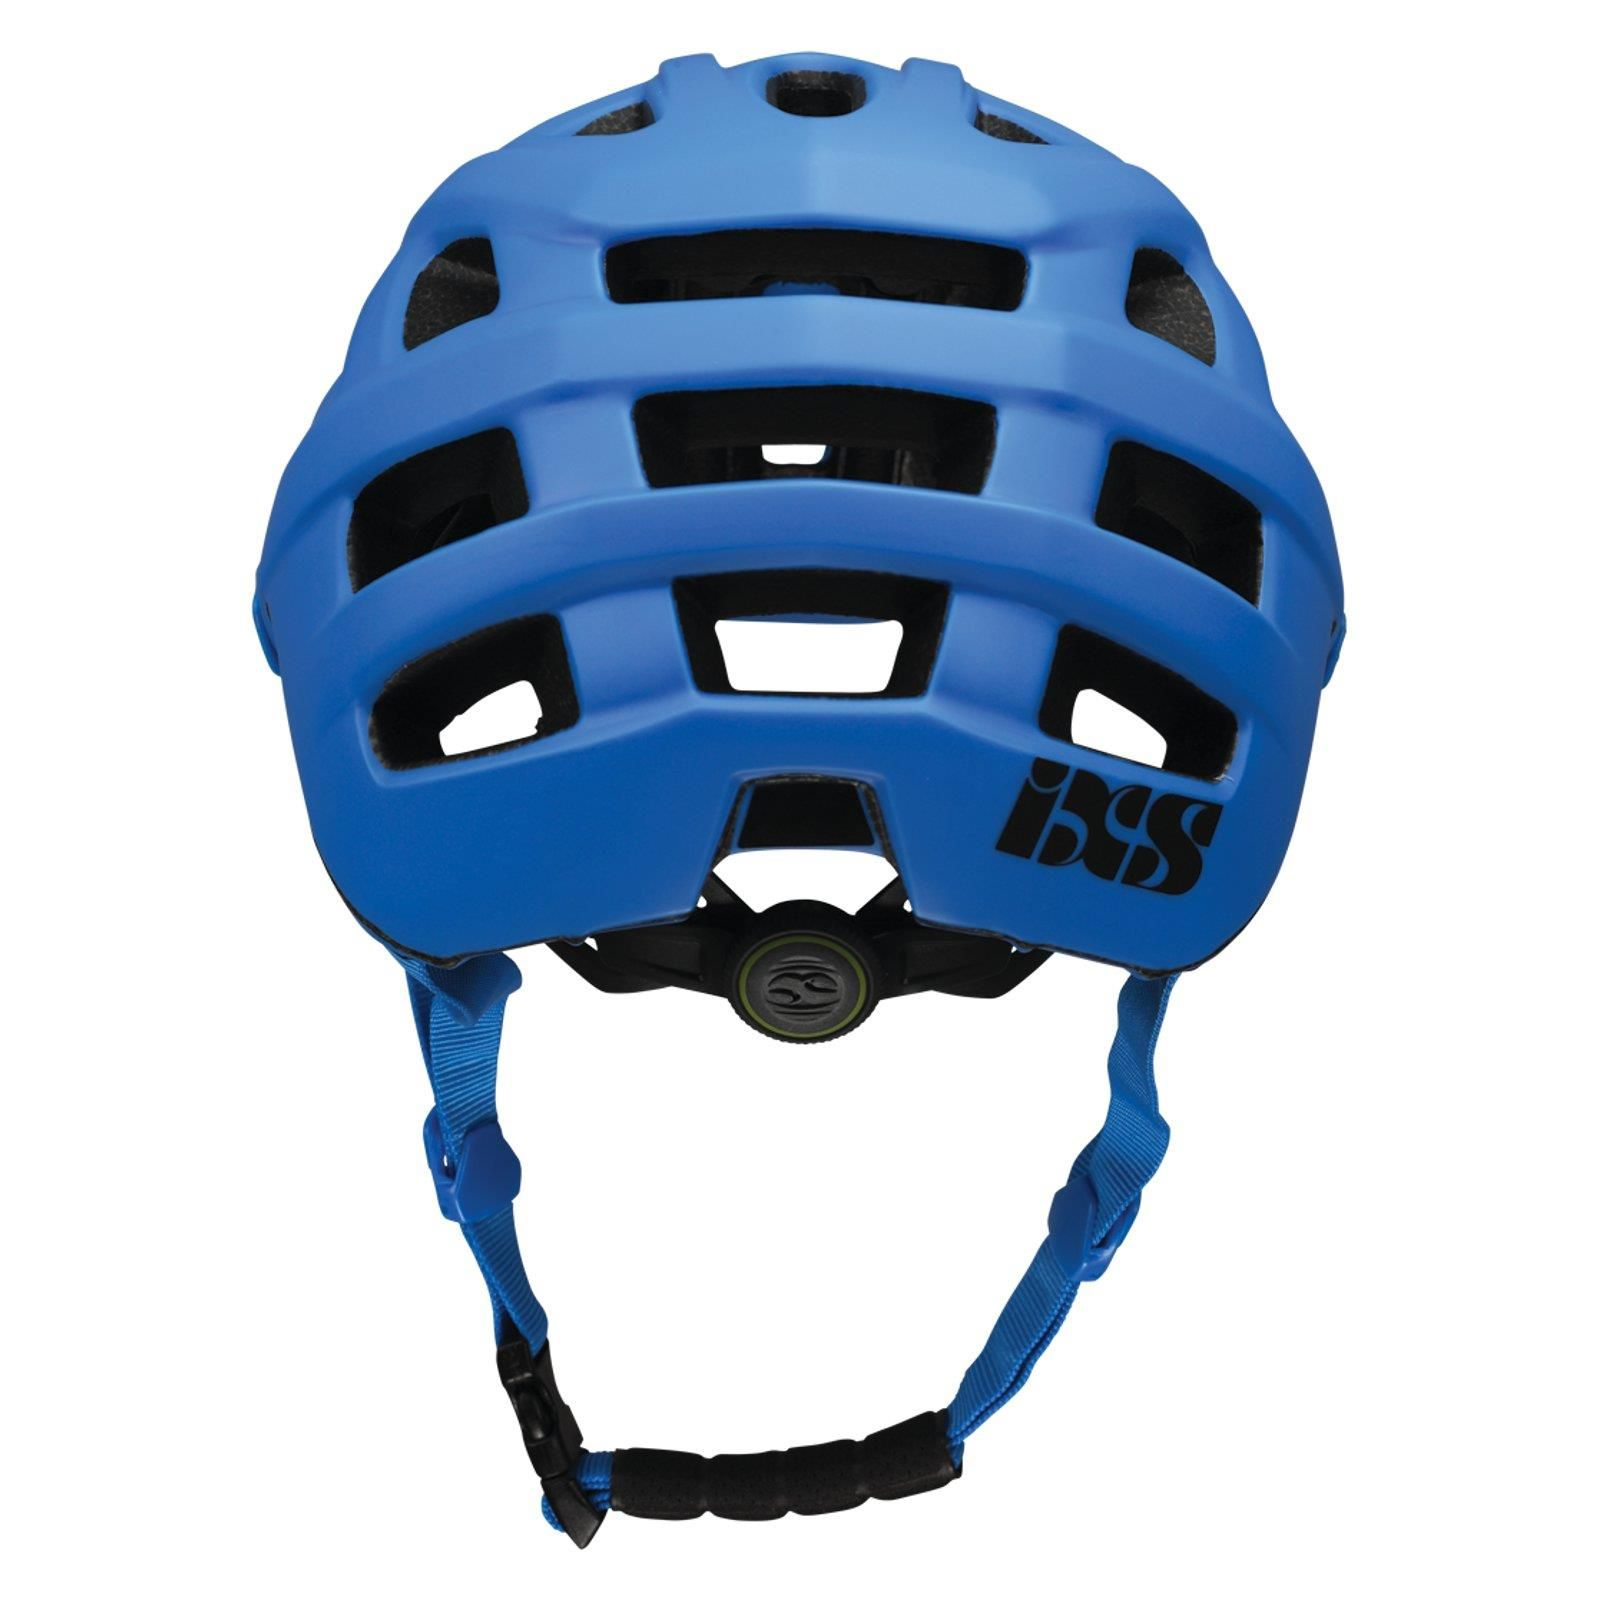 Ixs Trail Rs Evo Fahrrad Helm All Mountain Bike Am Mtb Enduro Dh Downhill Inmold All Mountain Bike Helmet Enduro Mtb